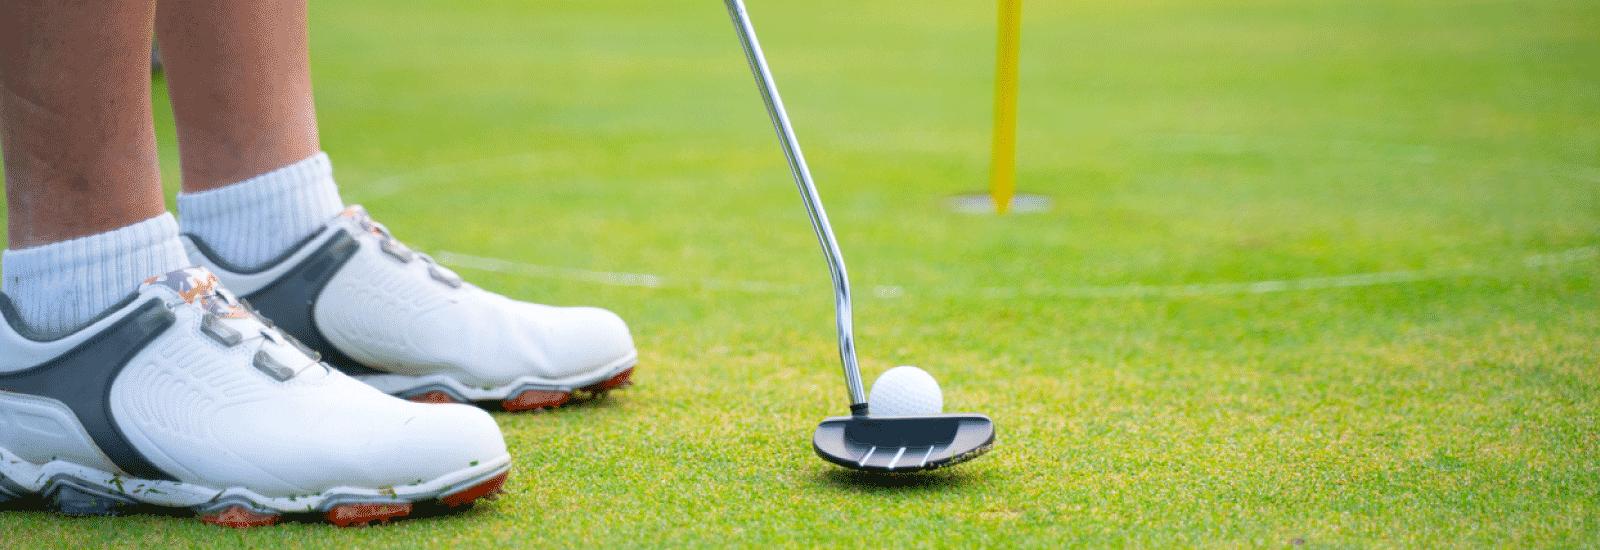 Kirtland AFB Golf Course